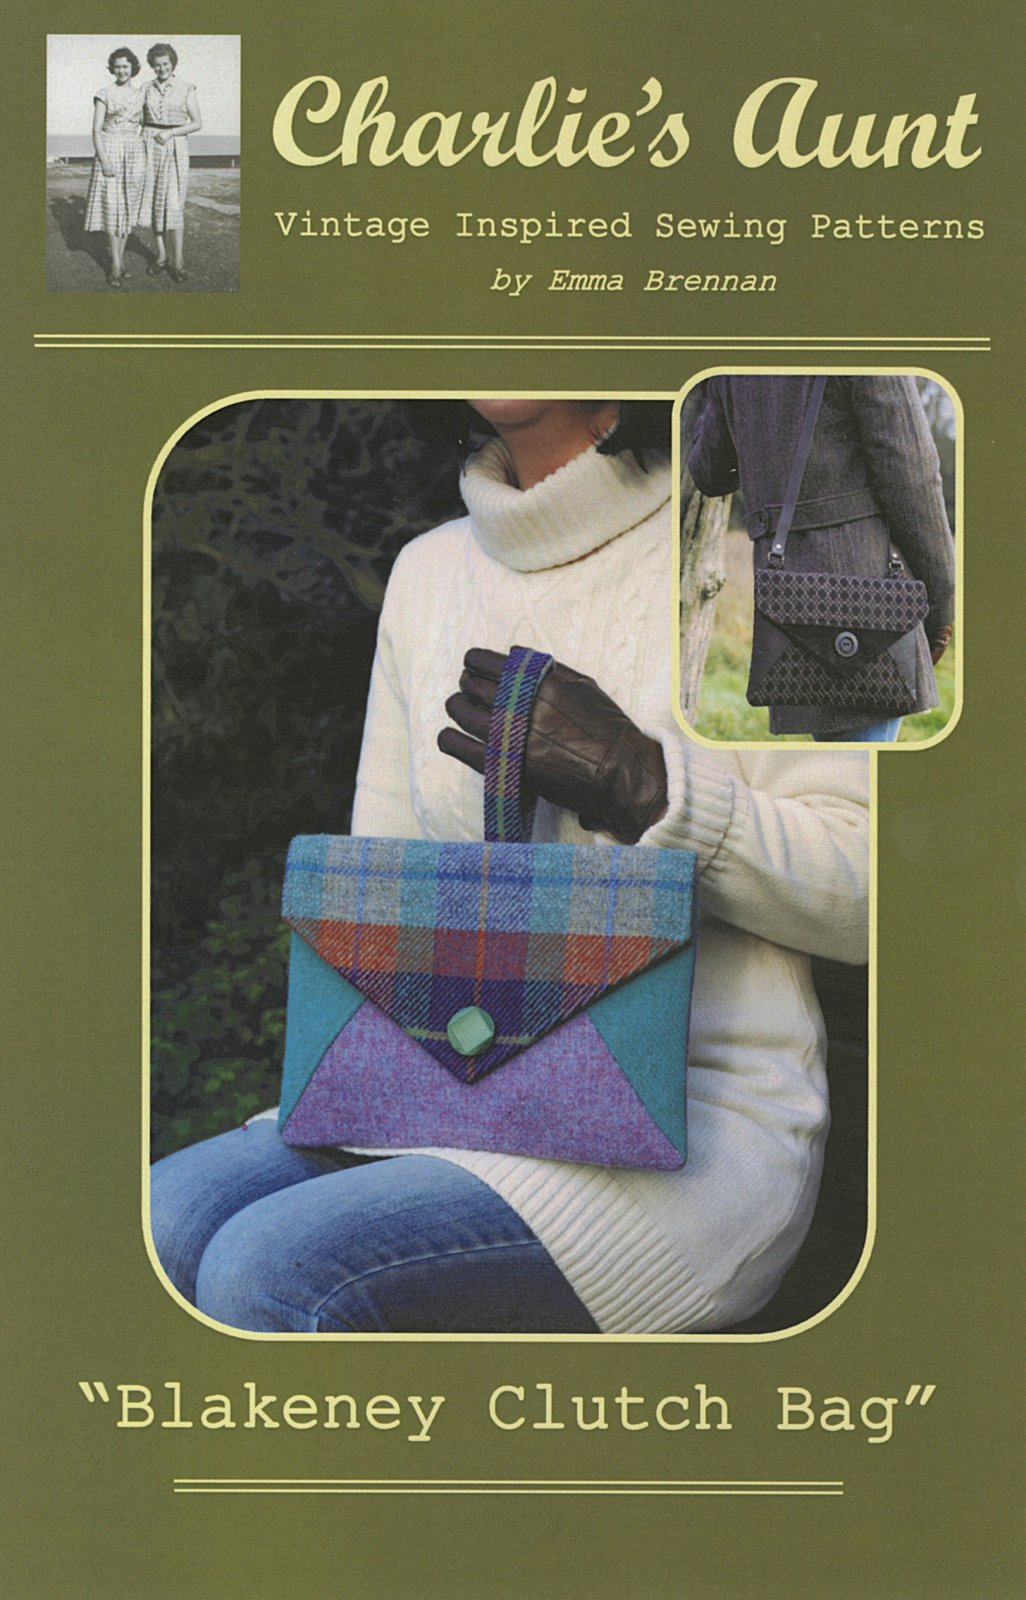 Blakeney Clutch Bag